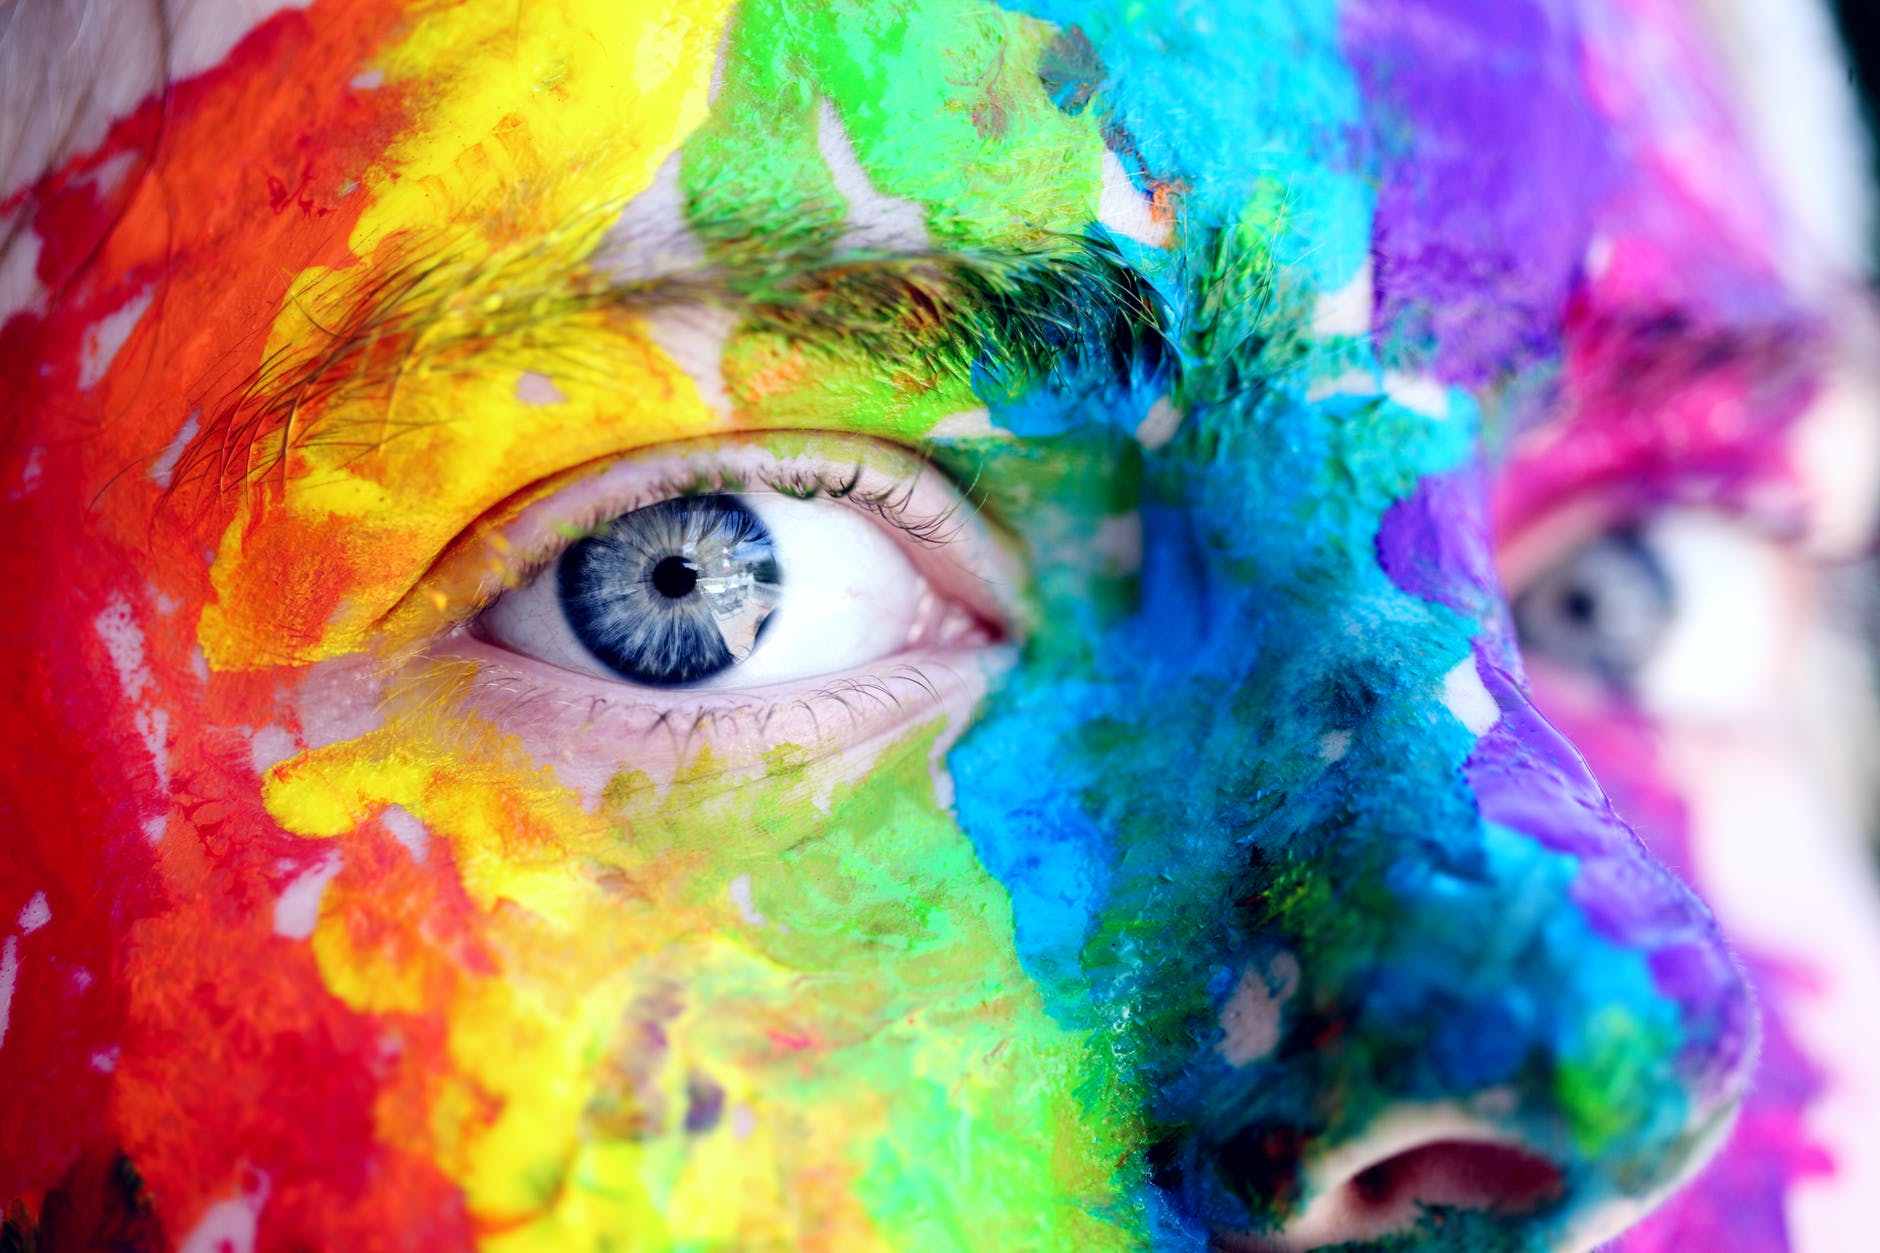 eyes rainbow face painting